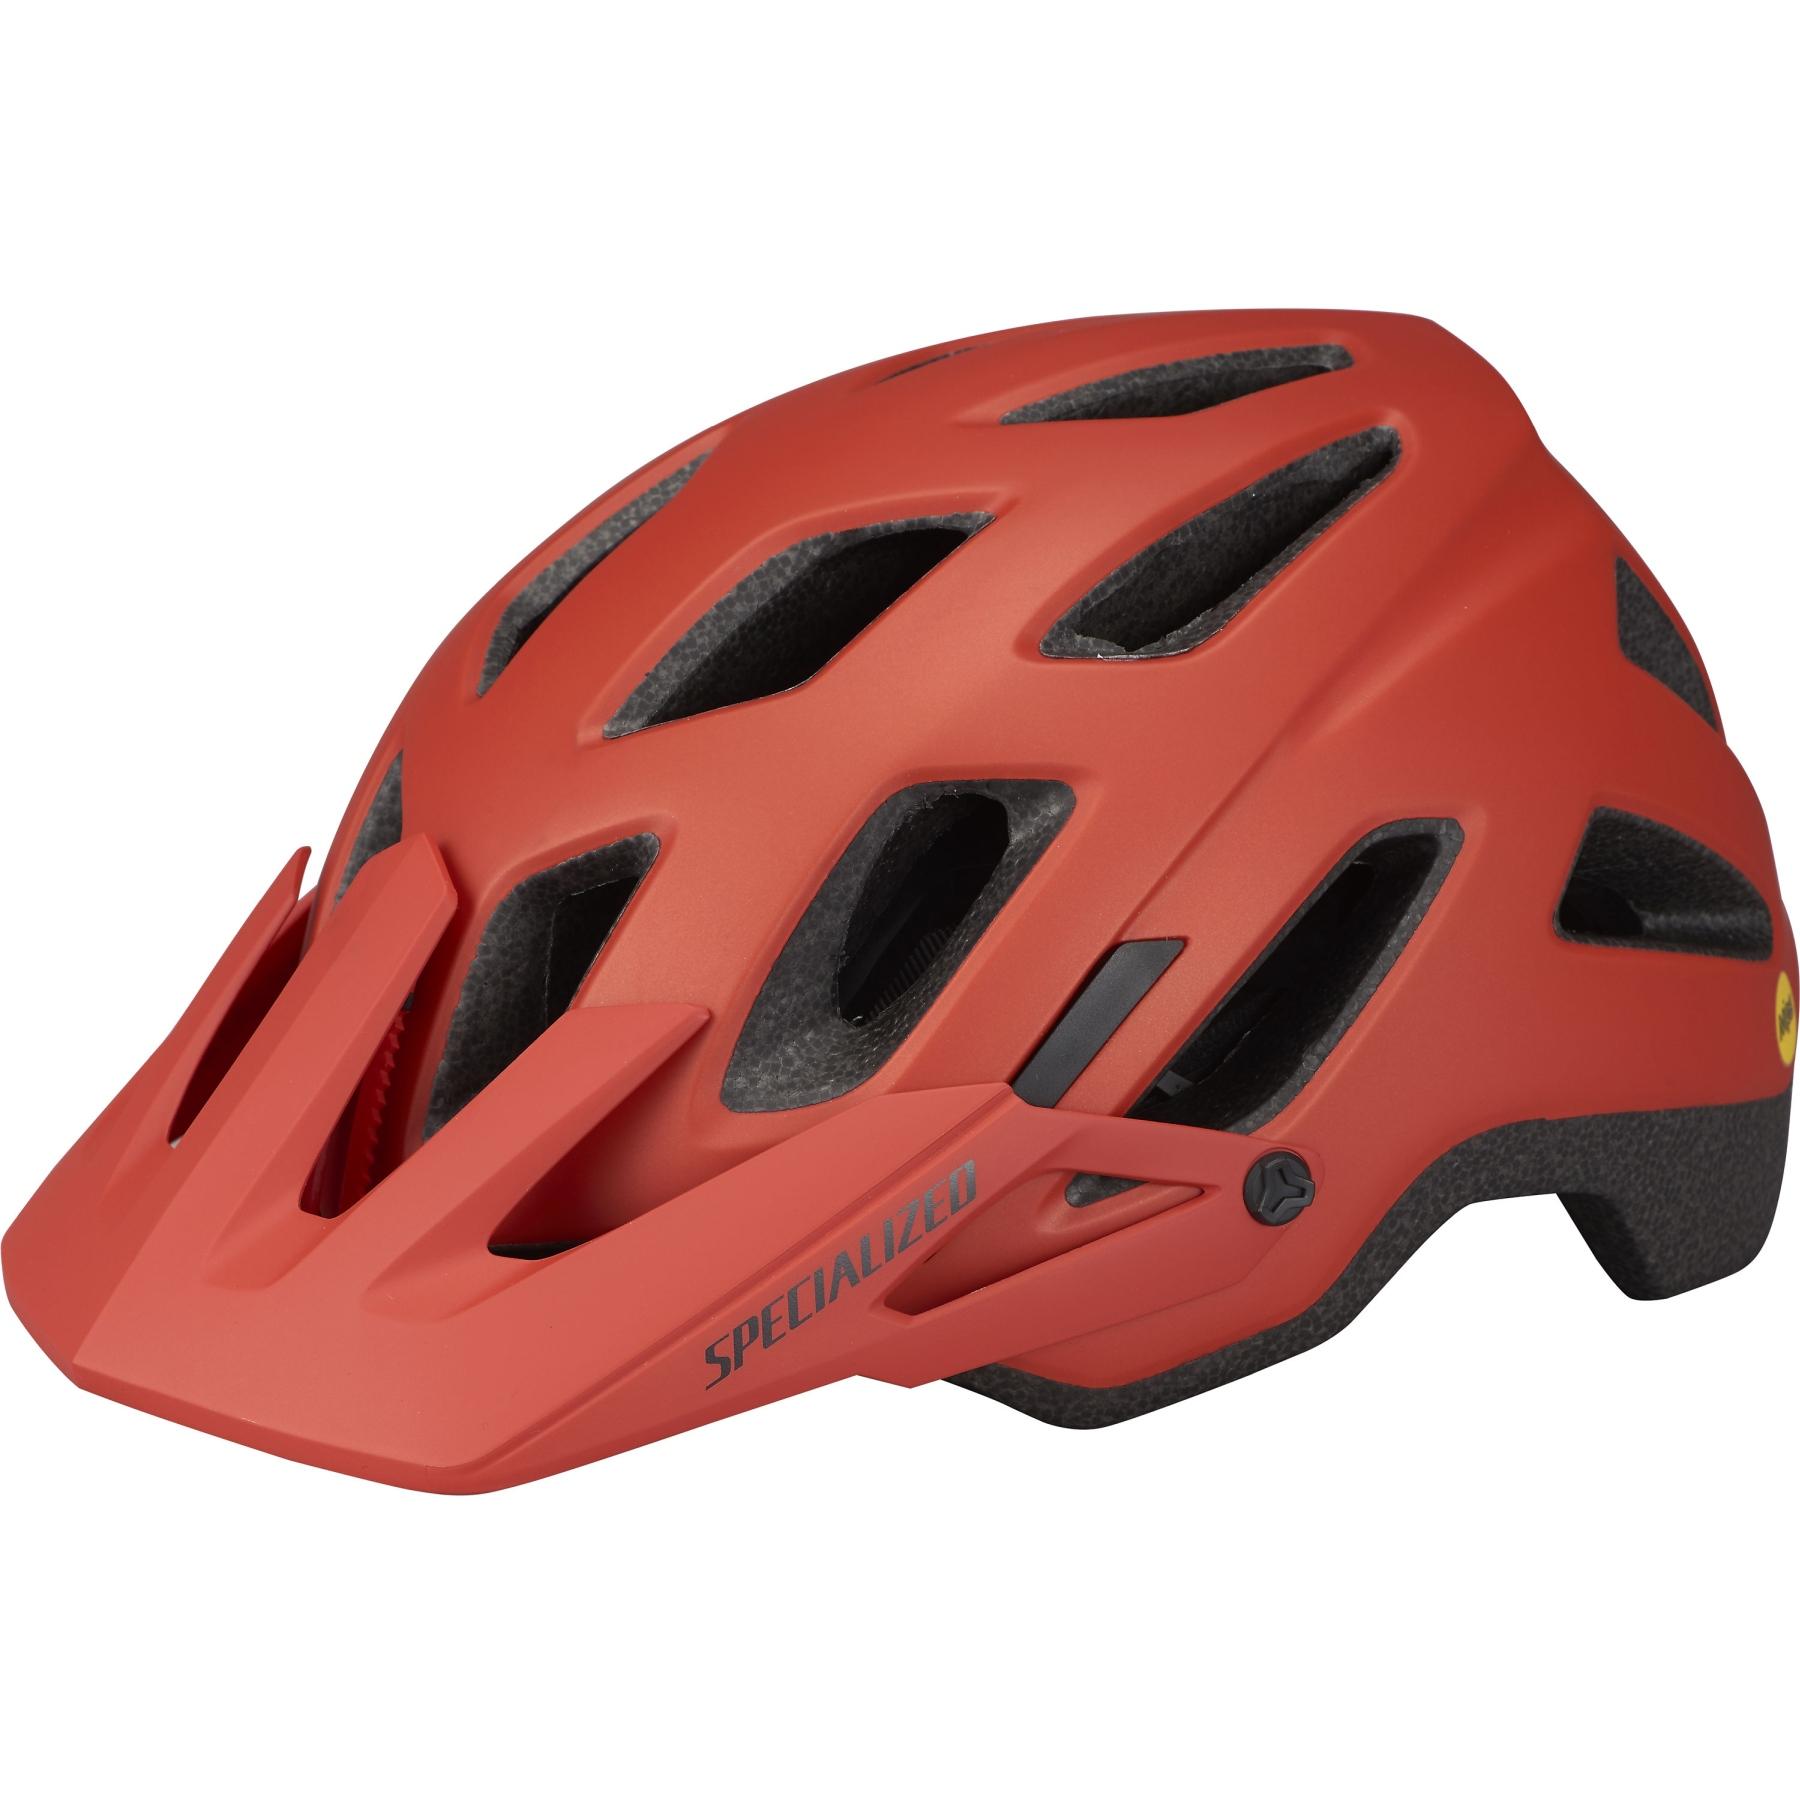 Specialized Ambush Comp MIPS Helmet - Satin Redwood